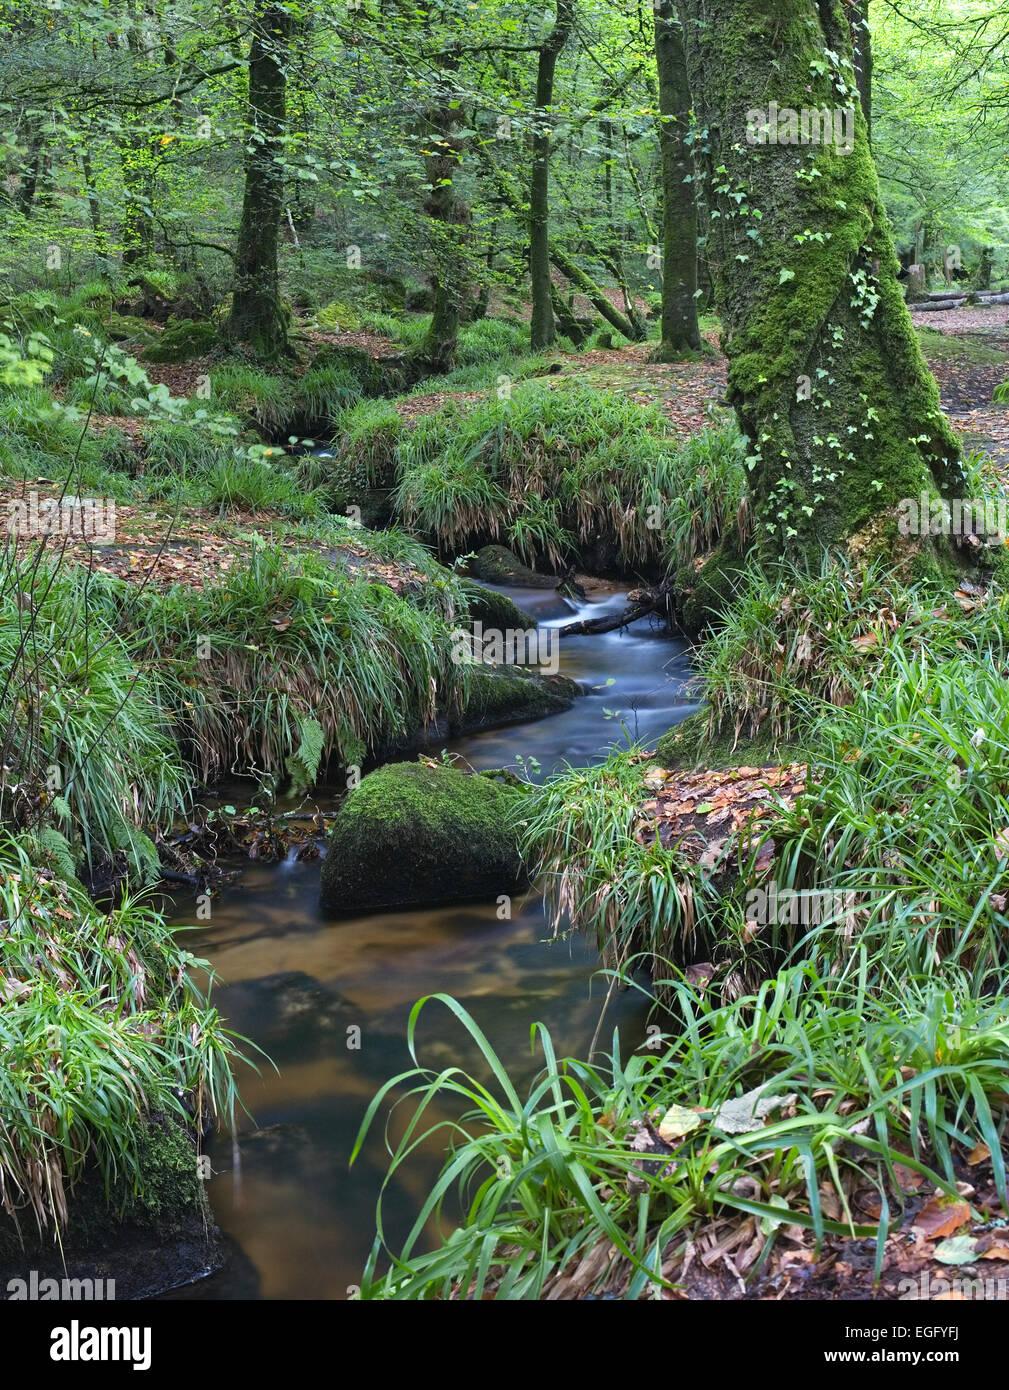 Golitha falls, Bodmin Moor, Cornwall - Woodland stream - Stock Image